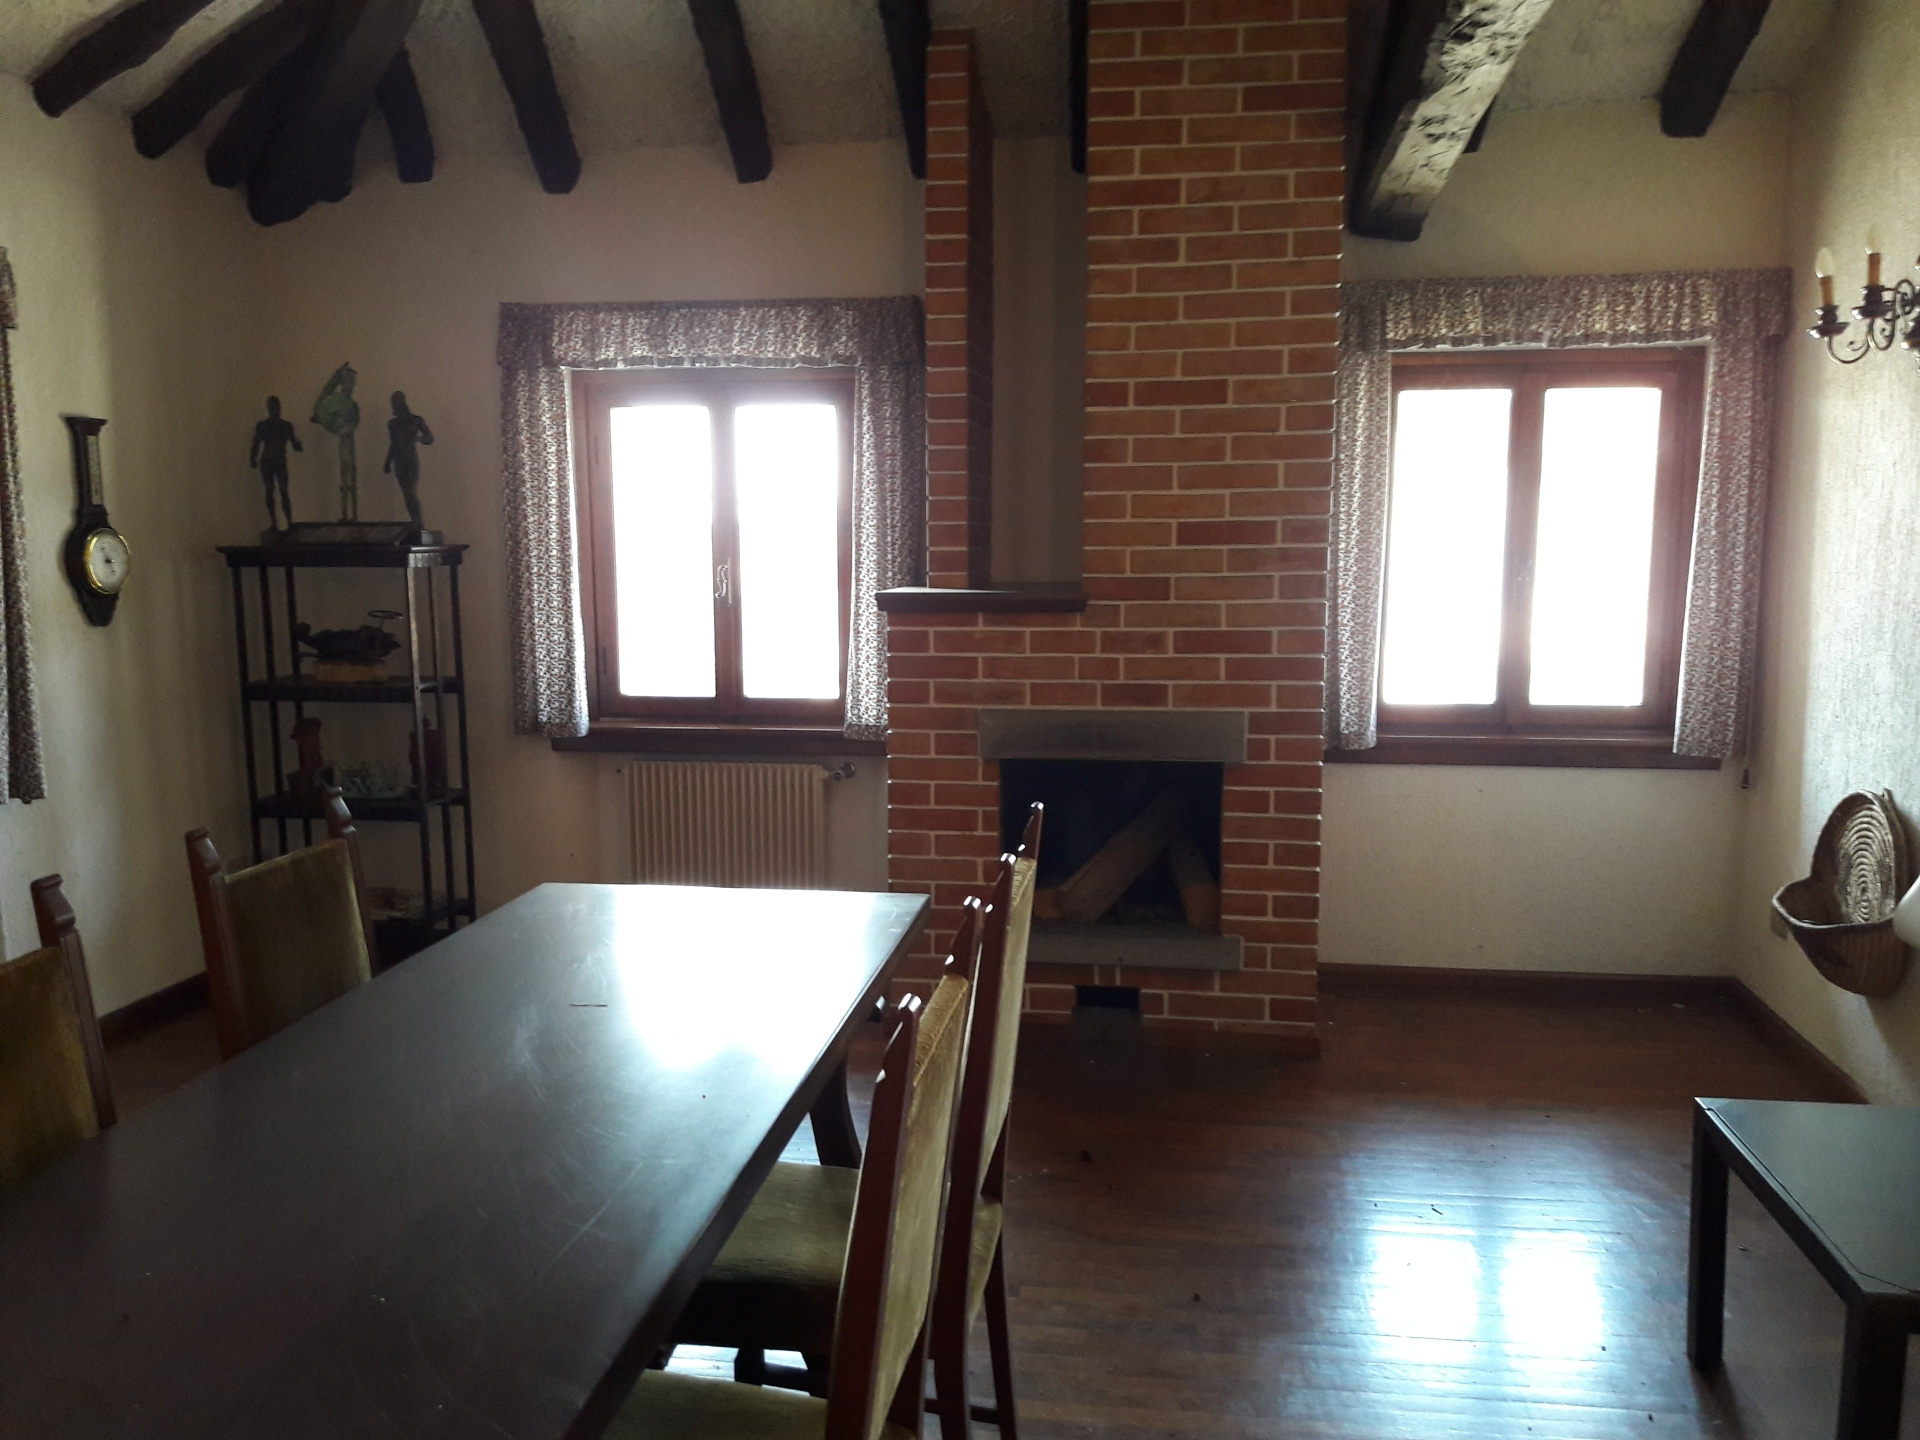 Casa in vendita a San Daniele del Friuli - Slideshow 2